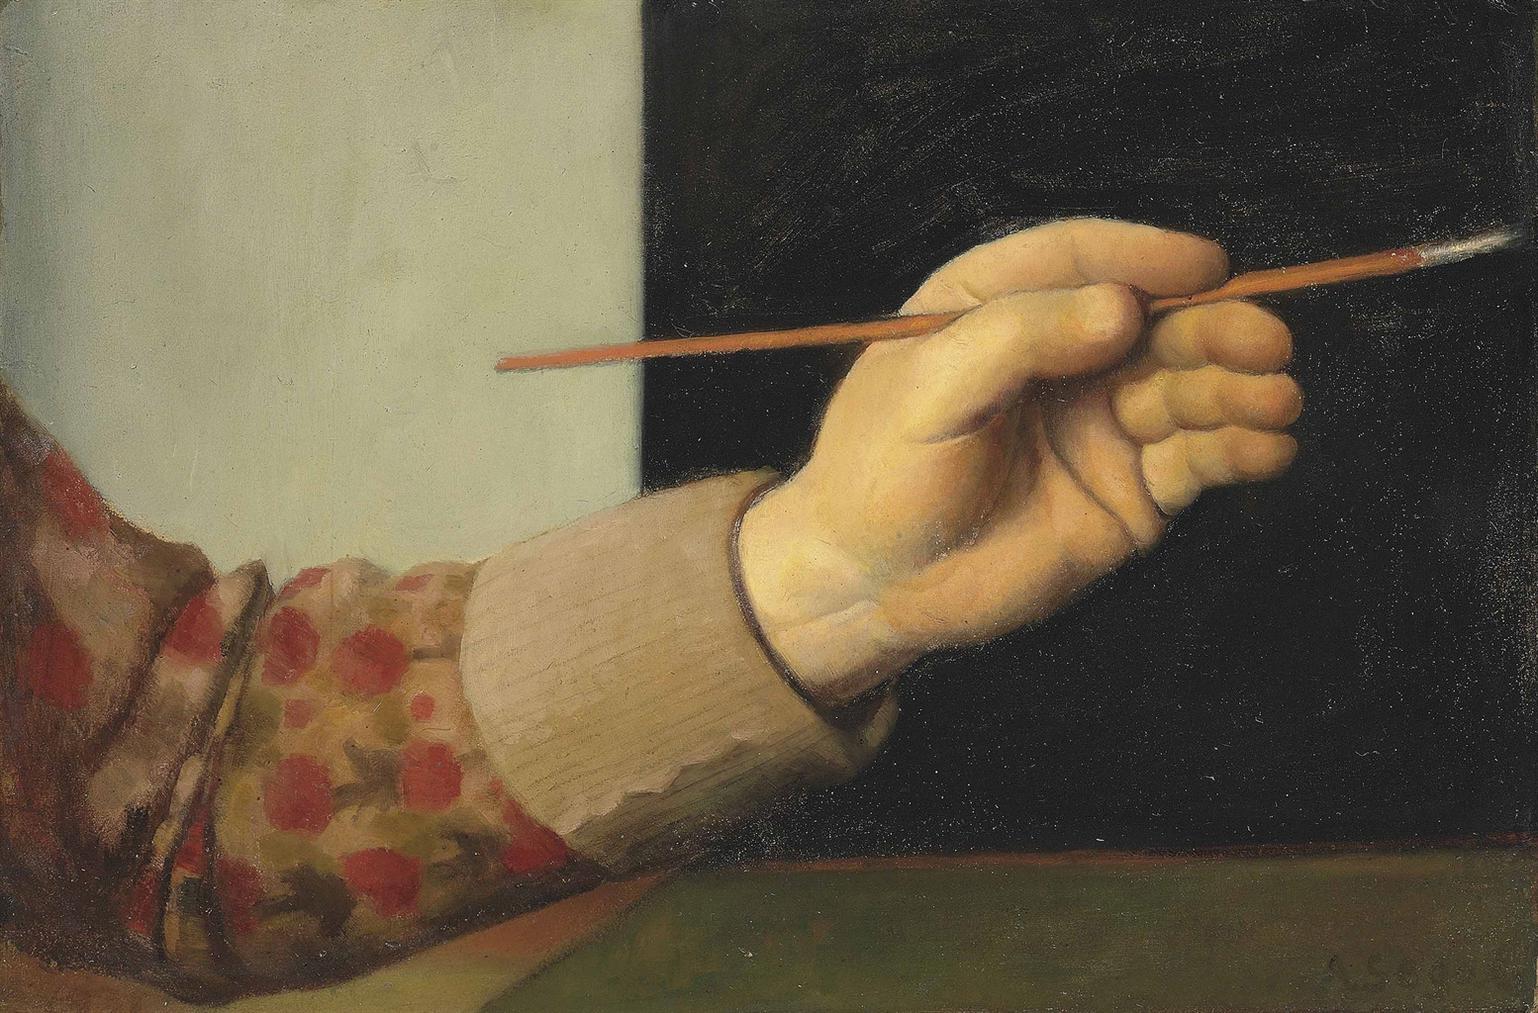 Arthur Segal-Hand Des Kunstlers Mit Pinsel-1933